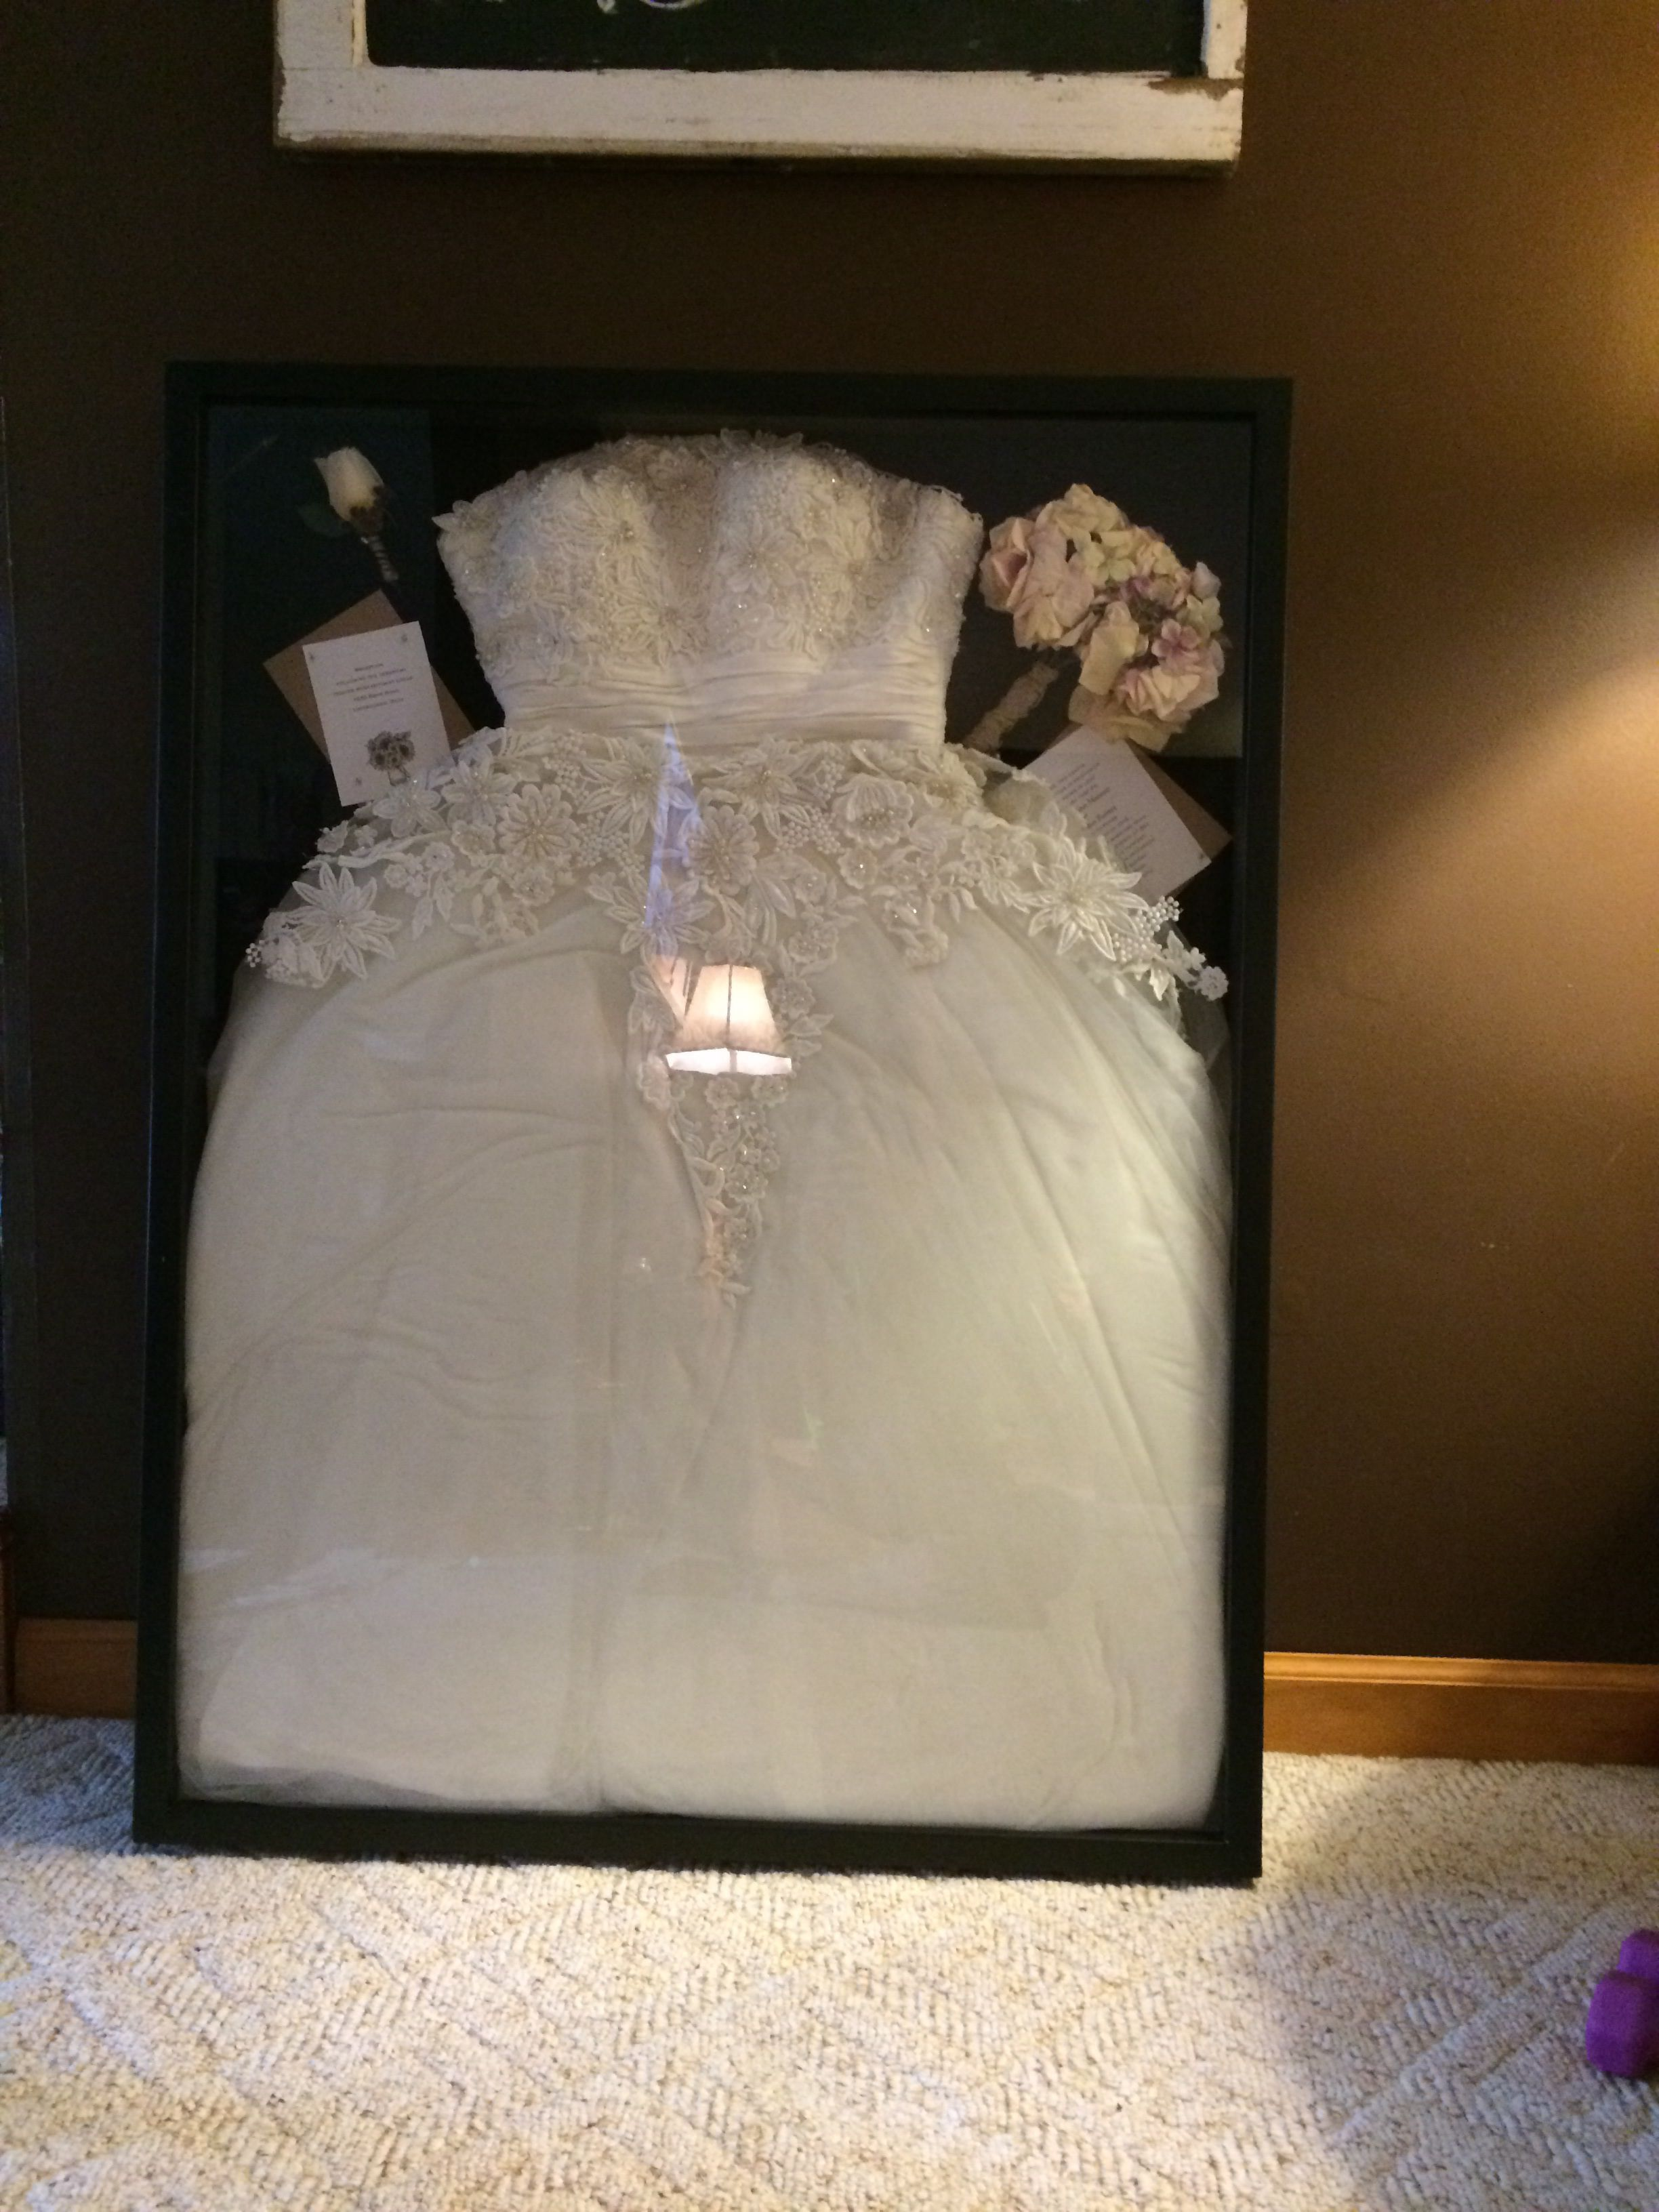 Wedding Dress In A Shadow Box Get The Largest One From Hobby Lobby I Need To Do This For My Dress Hochzeitskleid Aufbewahren Hochzeit Brautkleid Rahmen